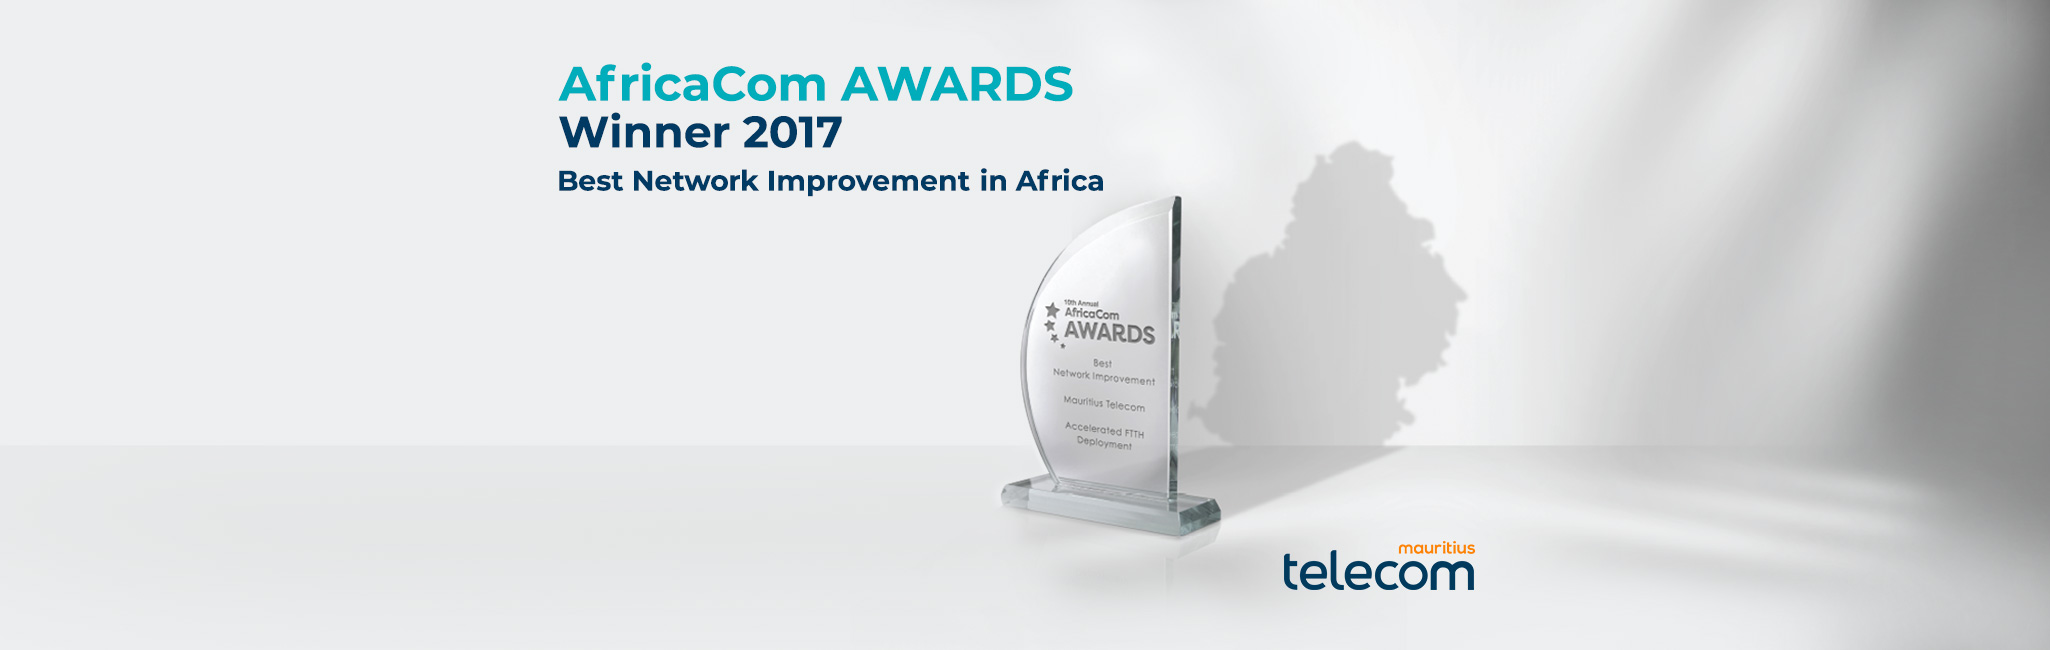 telecom award